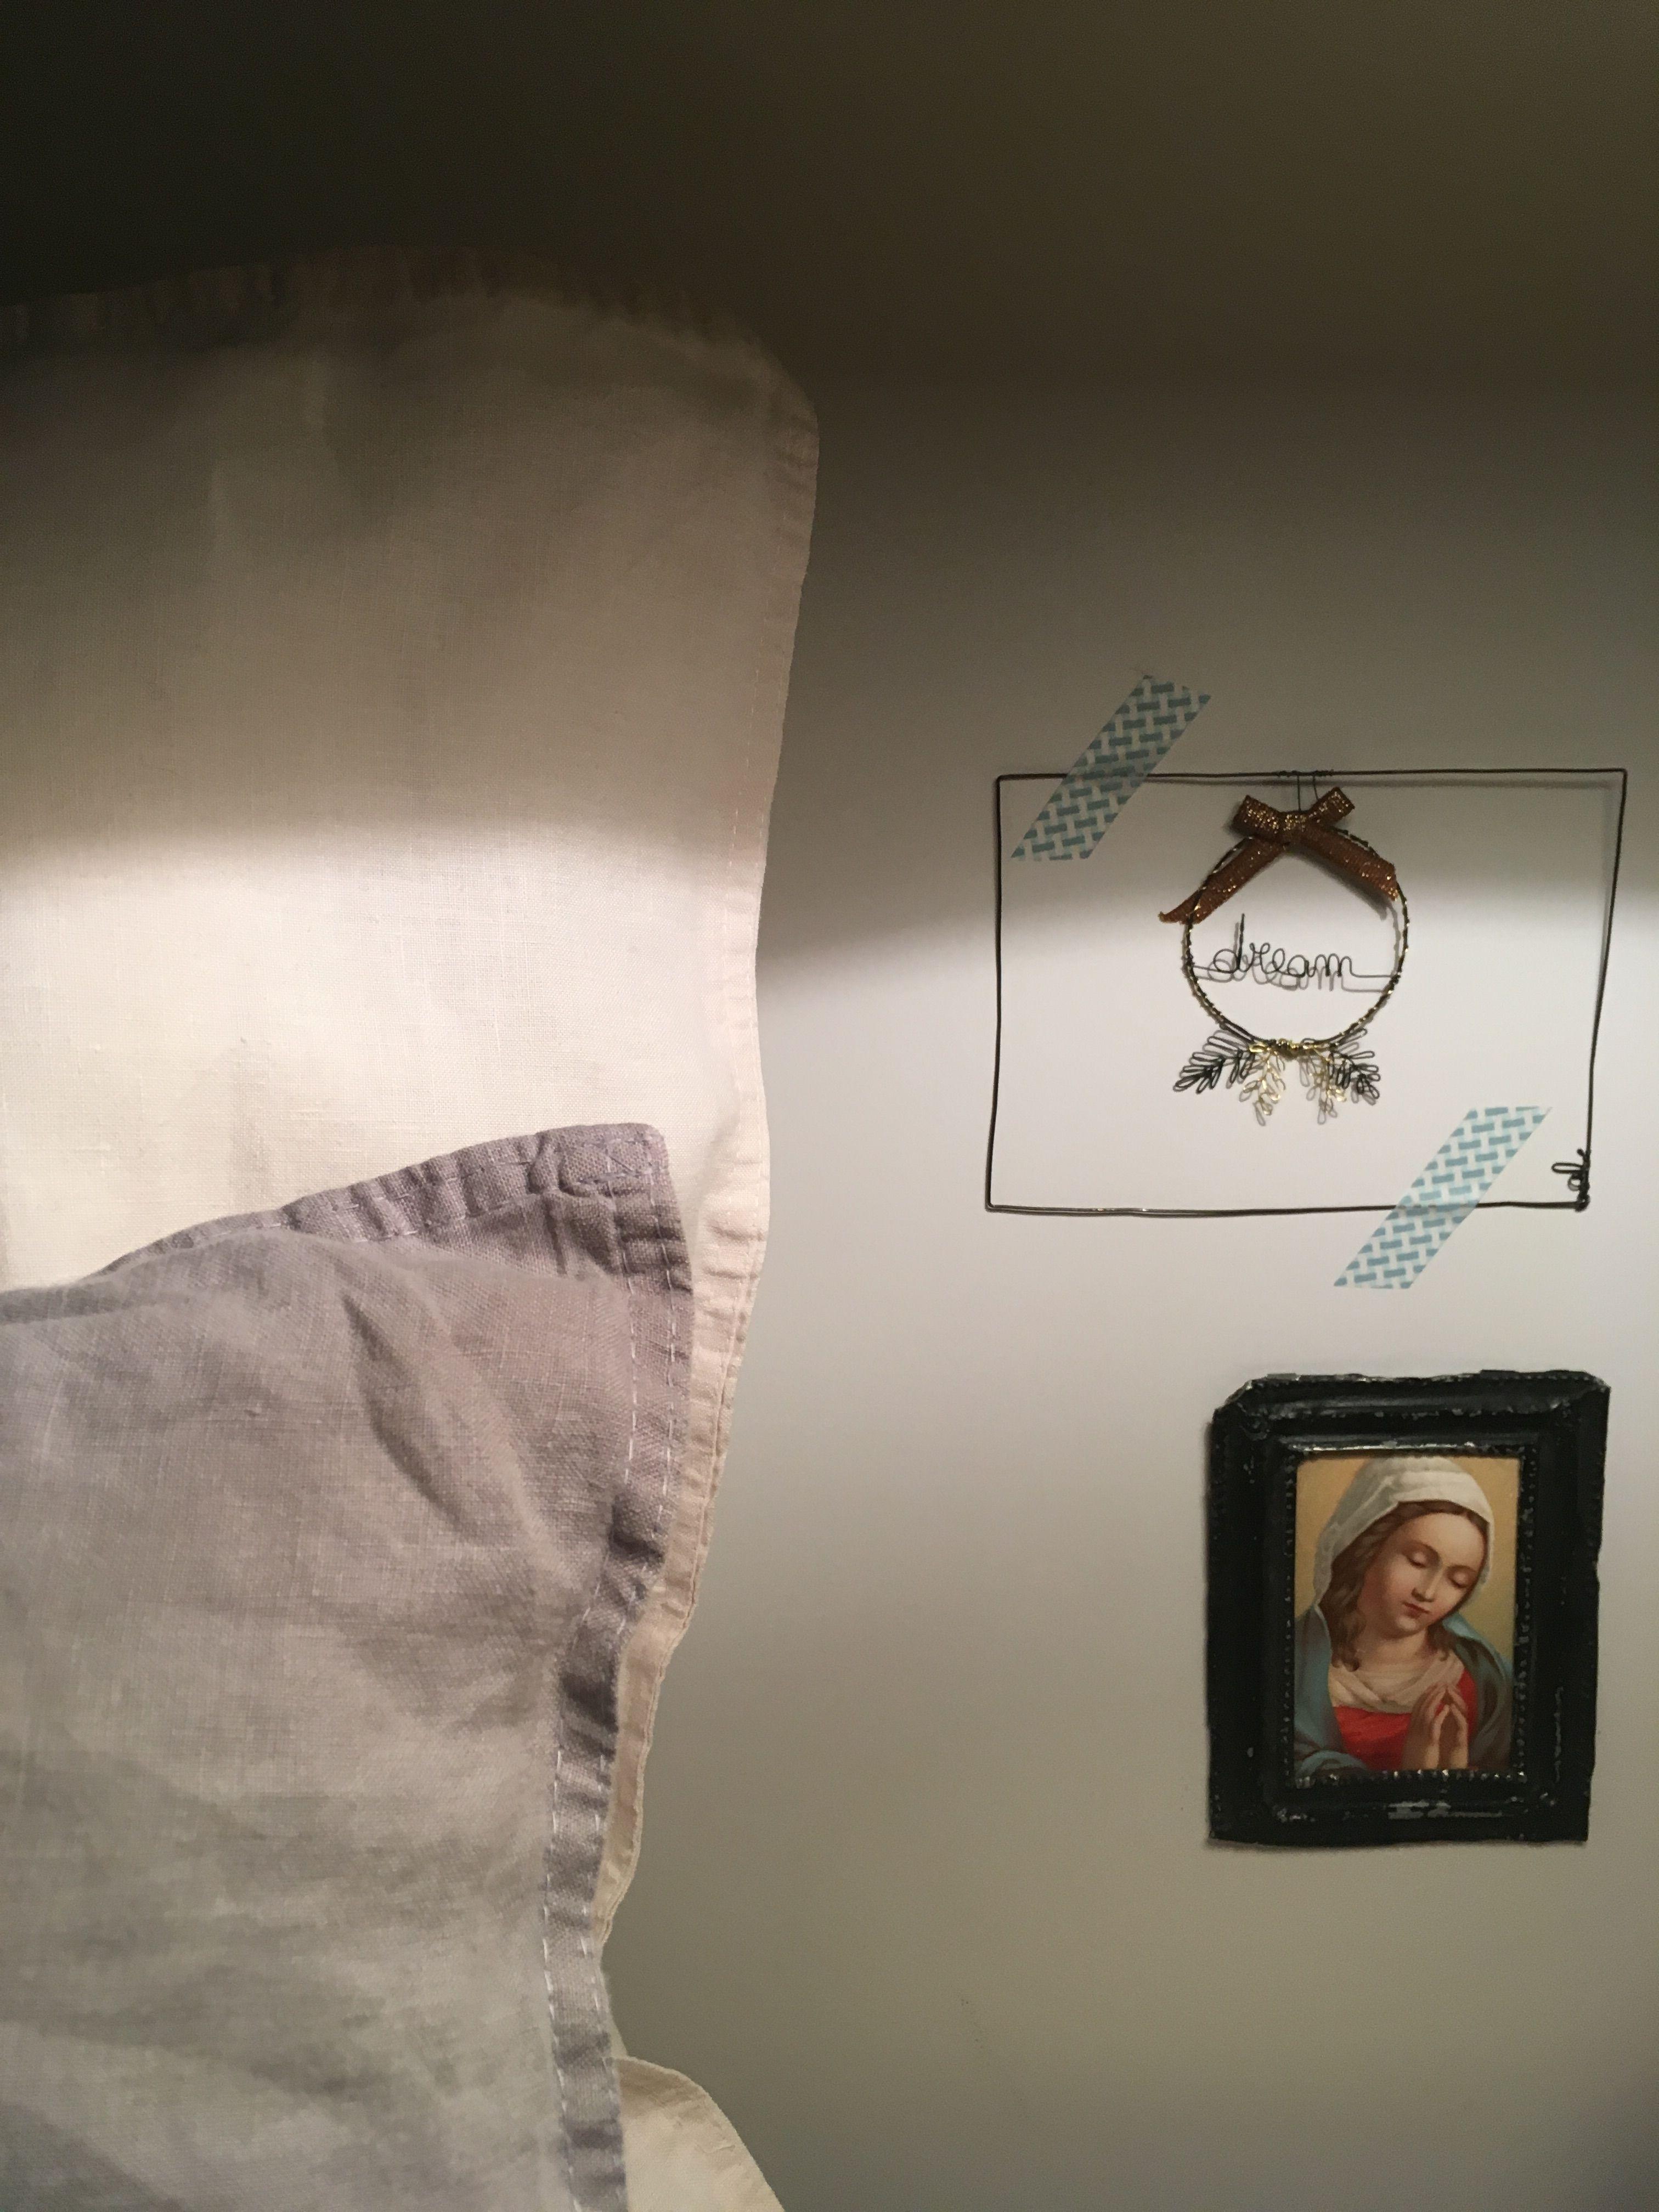 Lecornu Bedroom Furniture New Dream Astrid Lecornu Douceur Pinterest Dreams